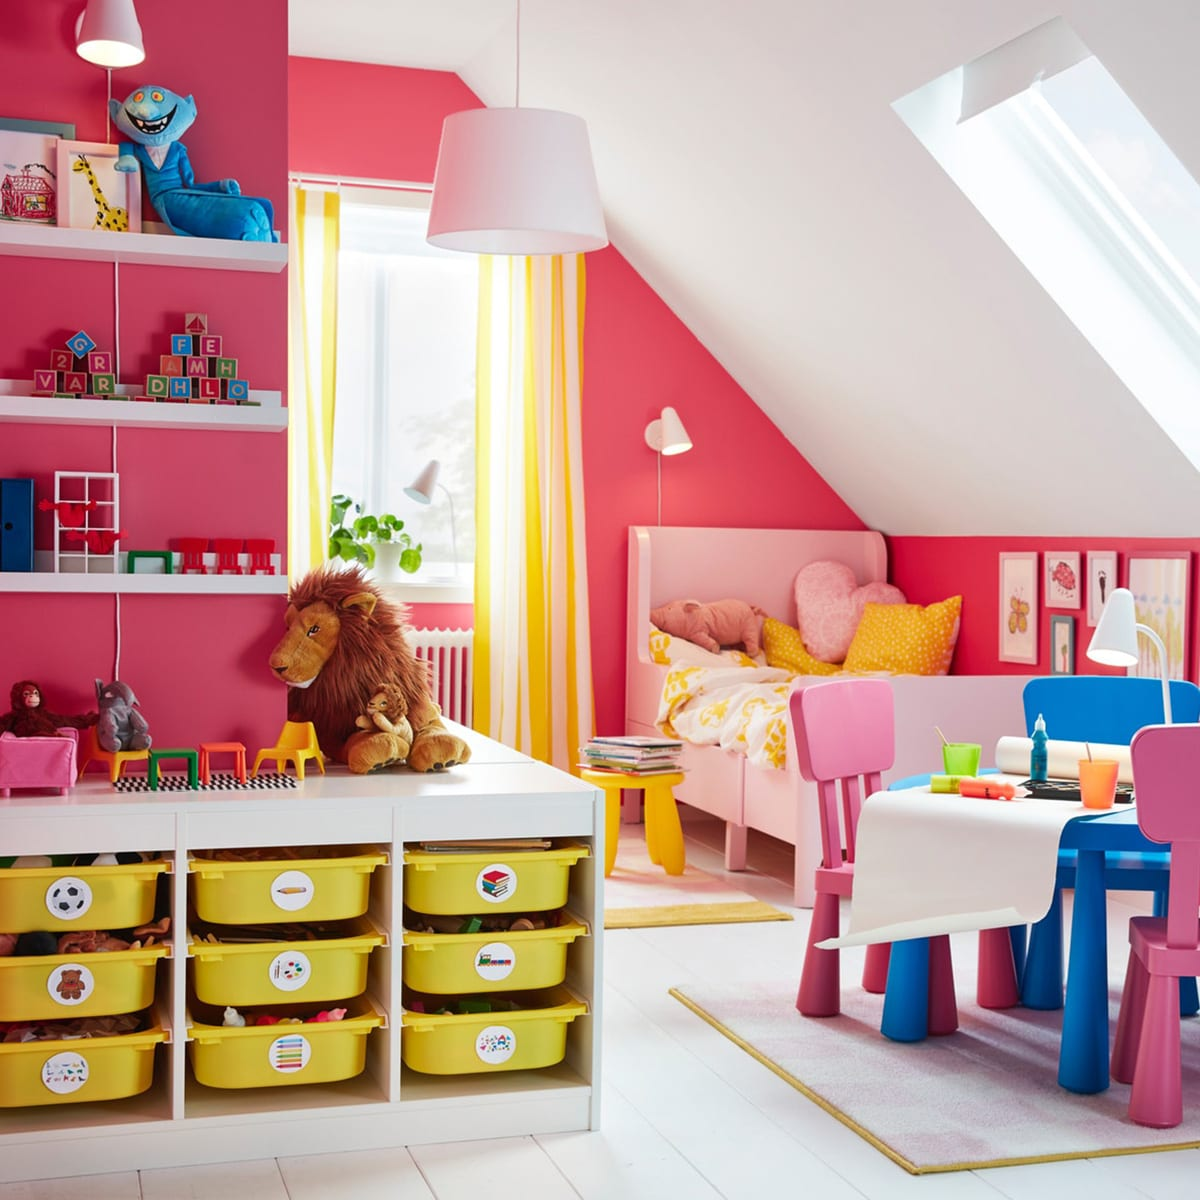 Camerette Tre Letti Ikea children's room gallery - ikea switzerland